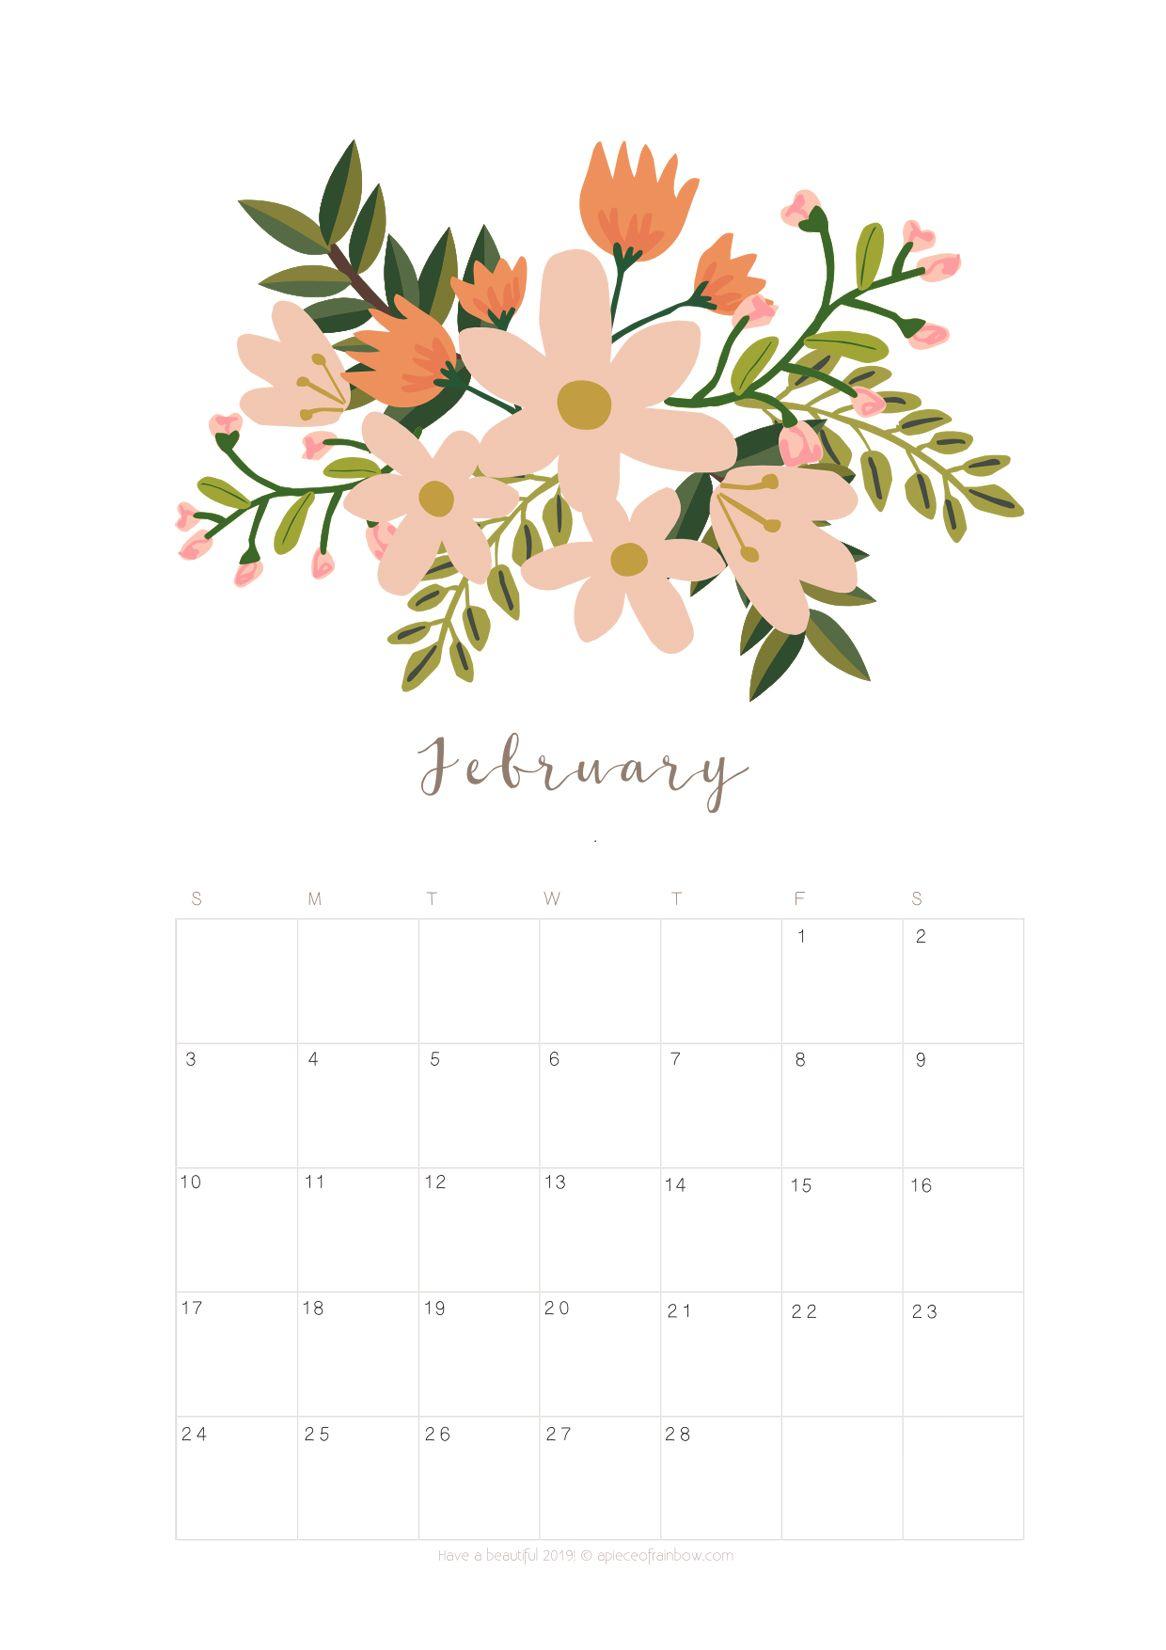 Beautiful February 2019 Calendar Printable February 2019 Calendar Monthly Planner {2 Designs